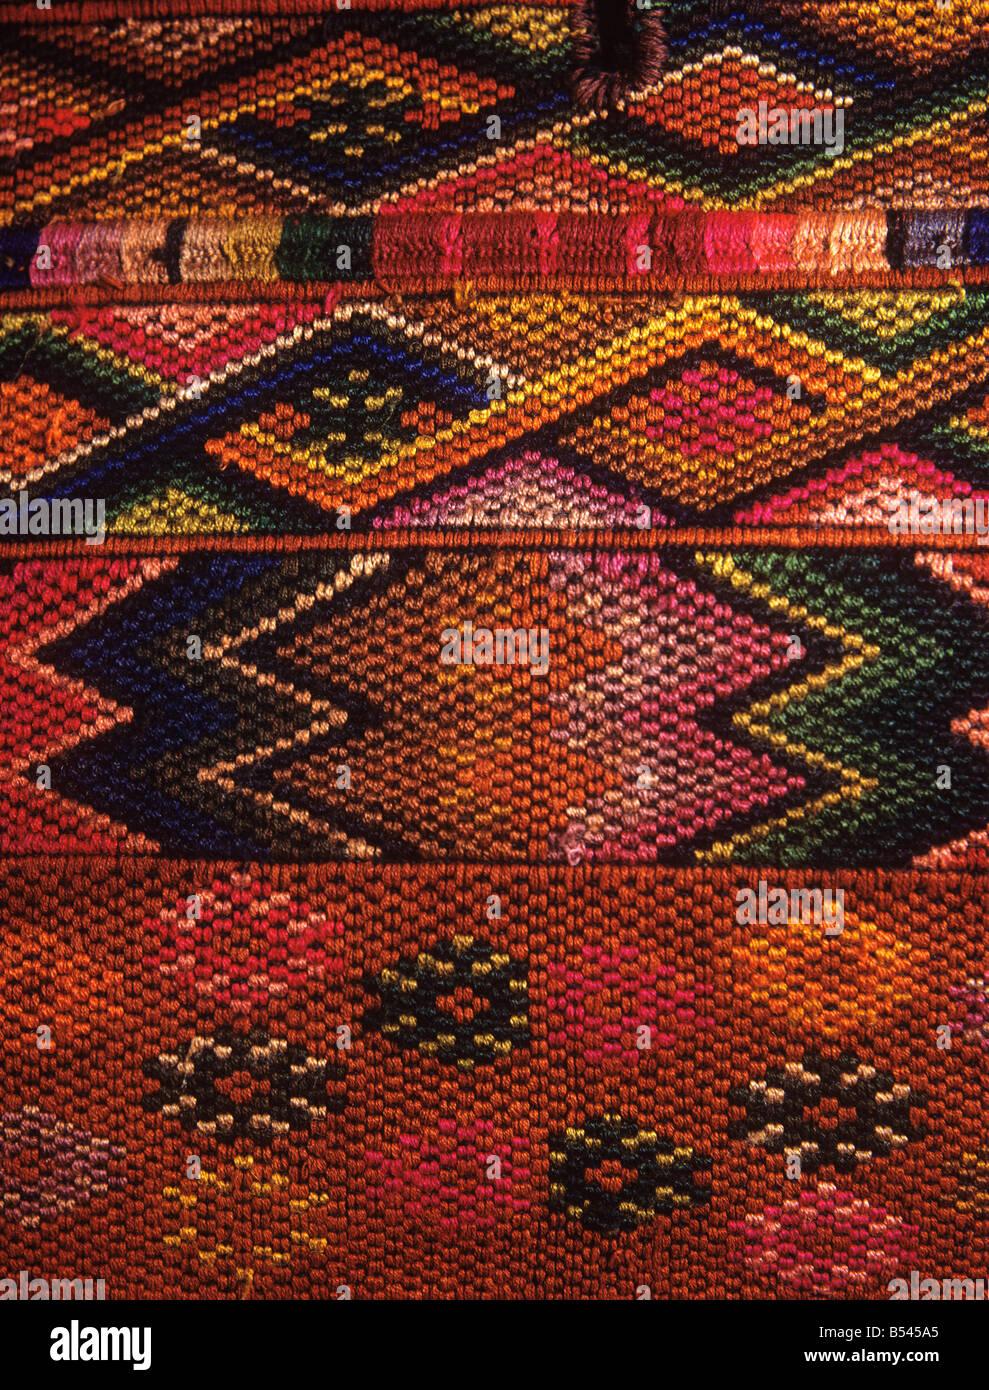 Guatemalan crafts detail of embroidered Hupile blouse from Lake Atitlan region of Guatemala - Stock Image